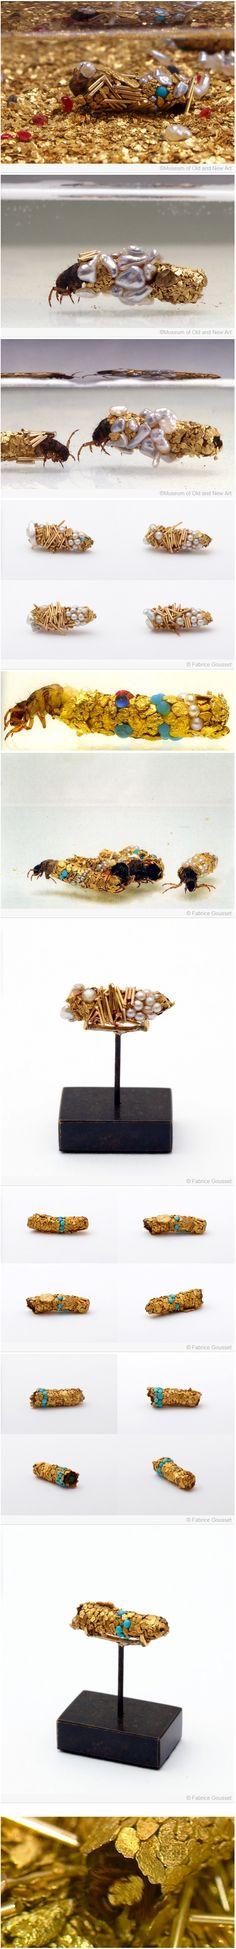 INSECT-ART (artiste Hubert Duprat & insect trichoptères)